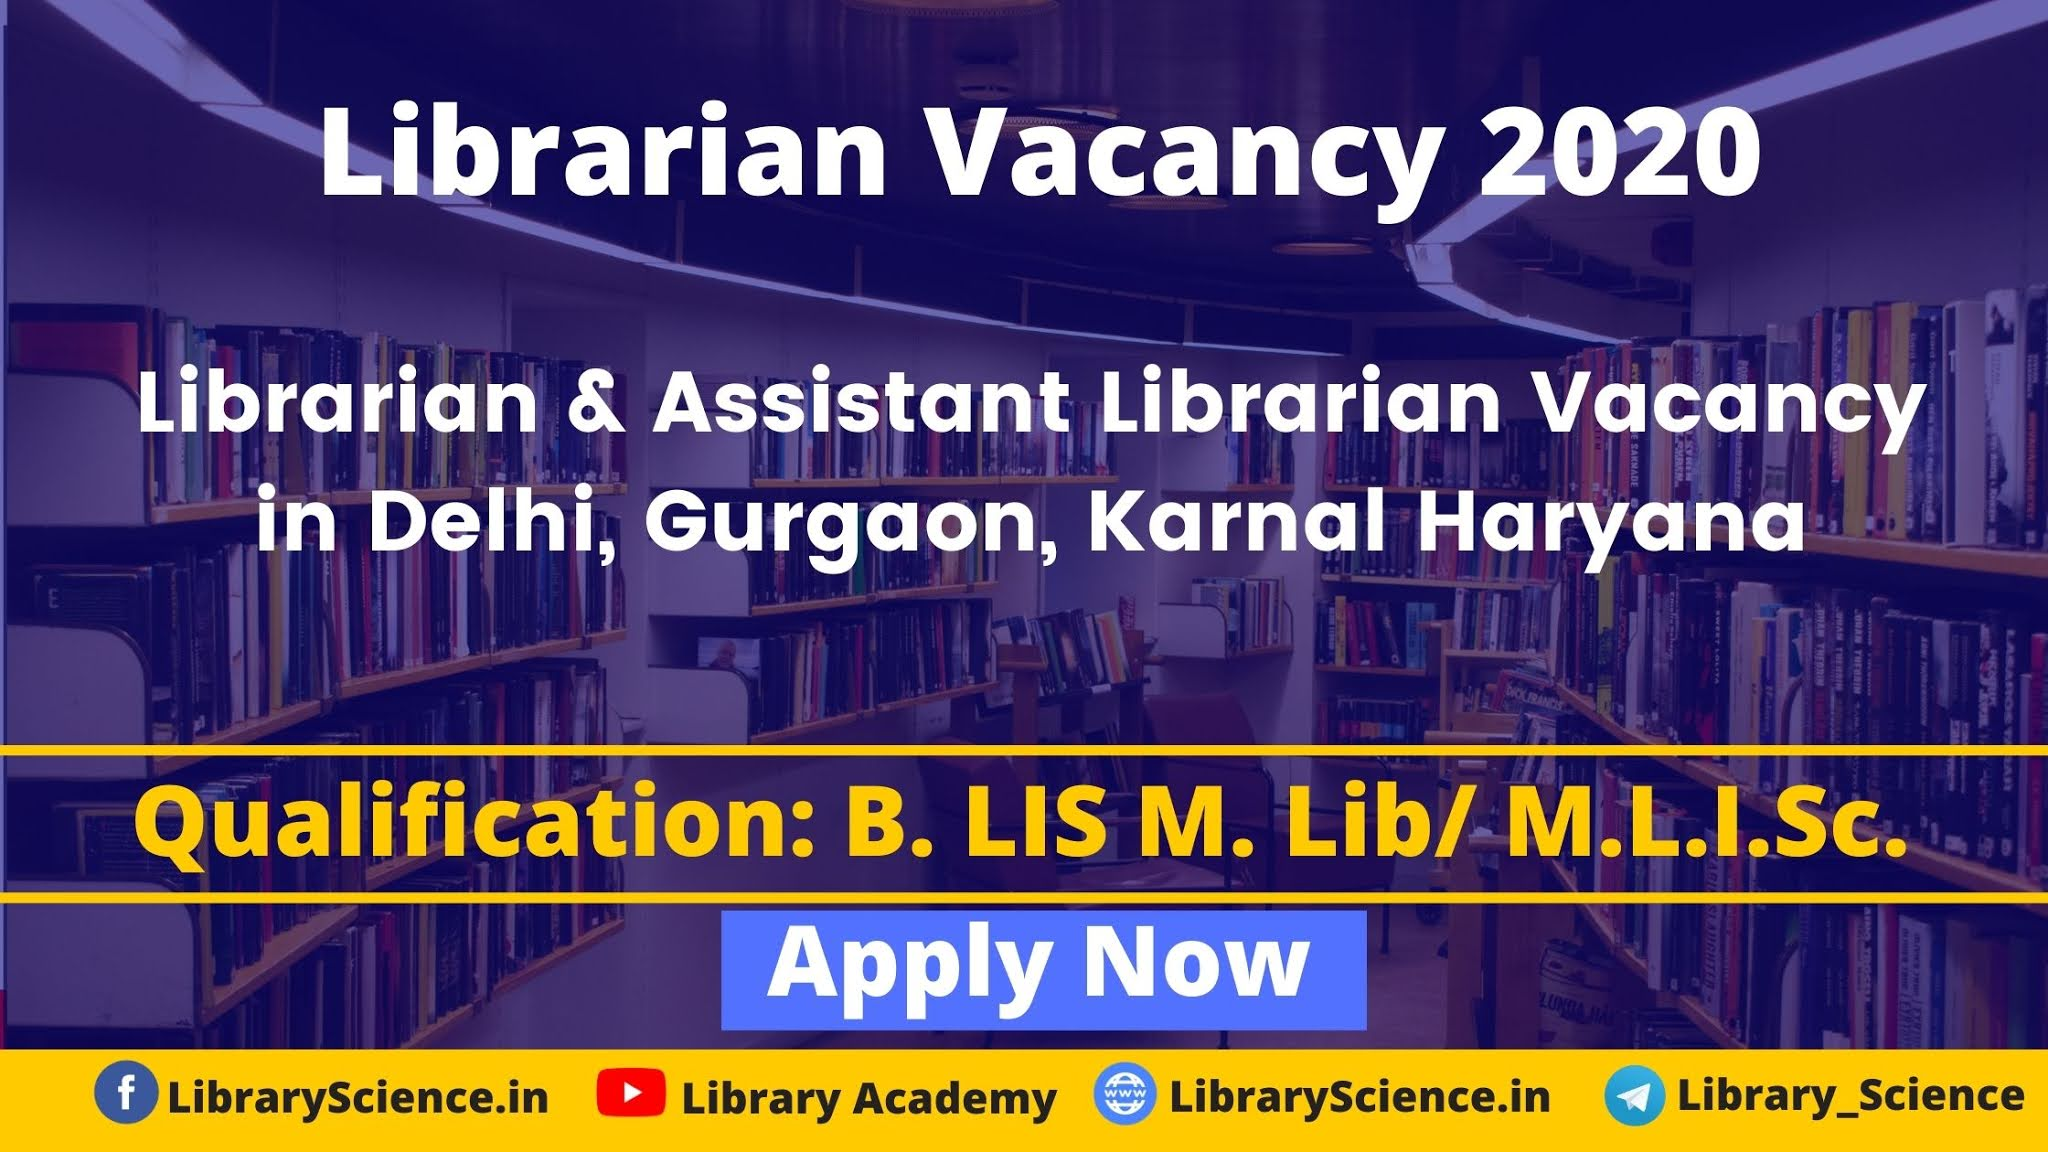 Librarian Vacancy